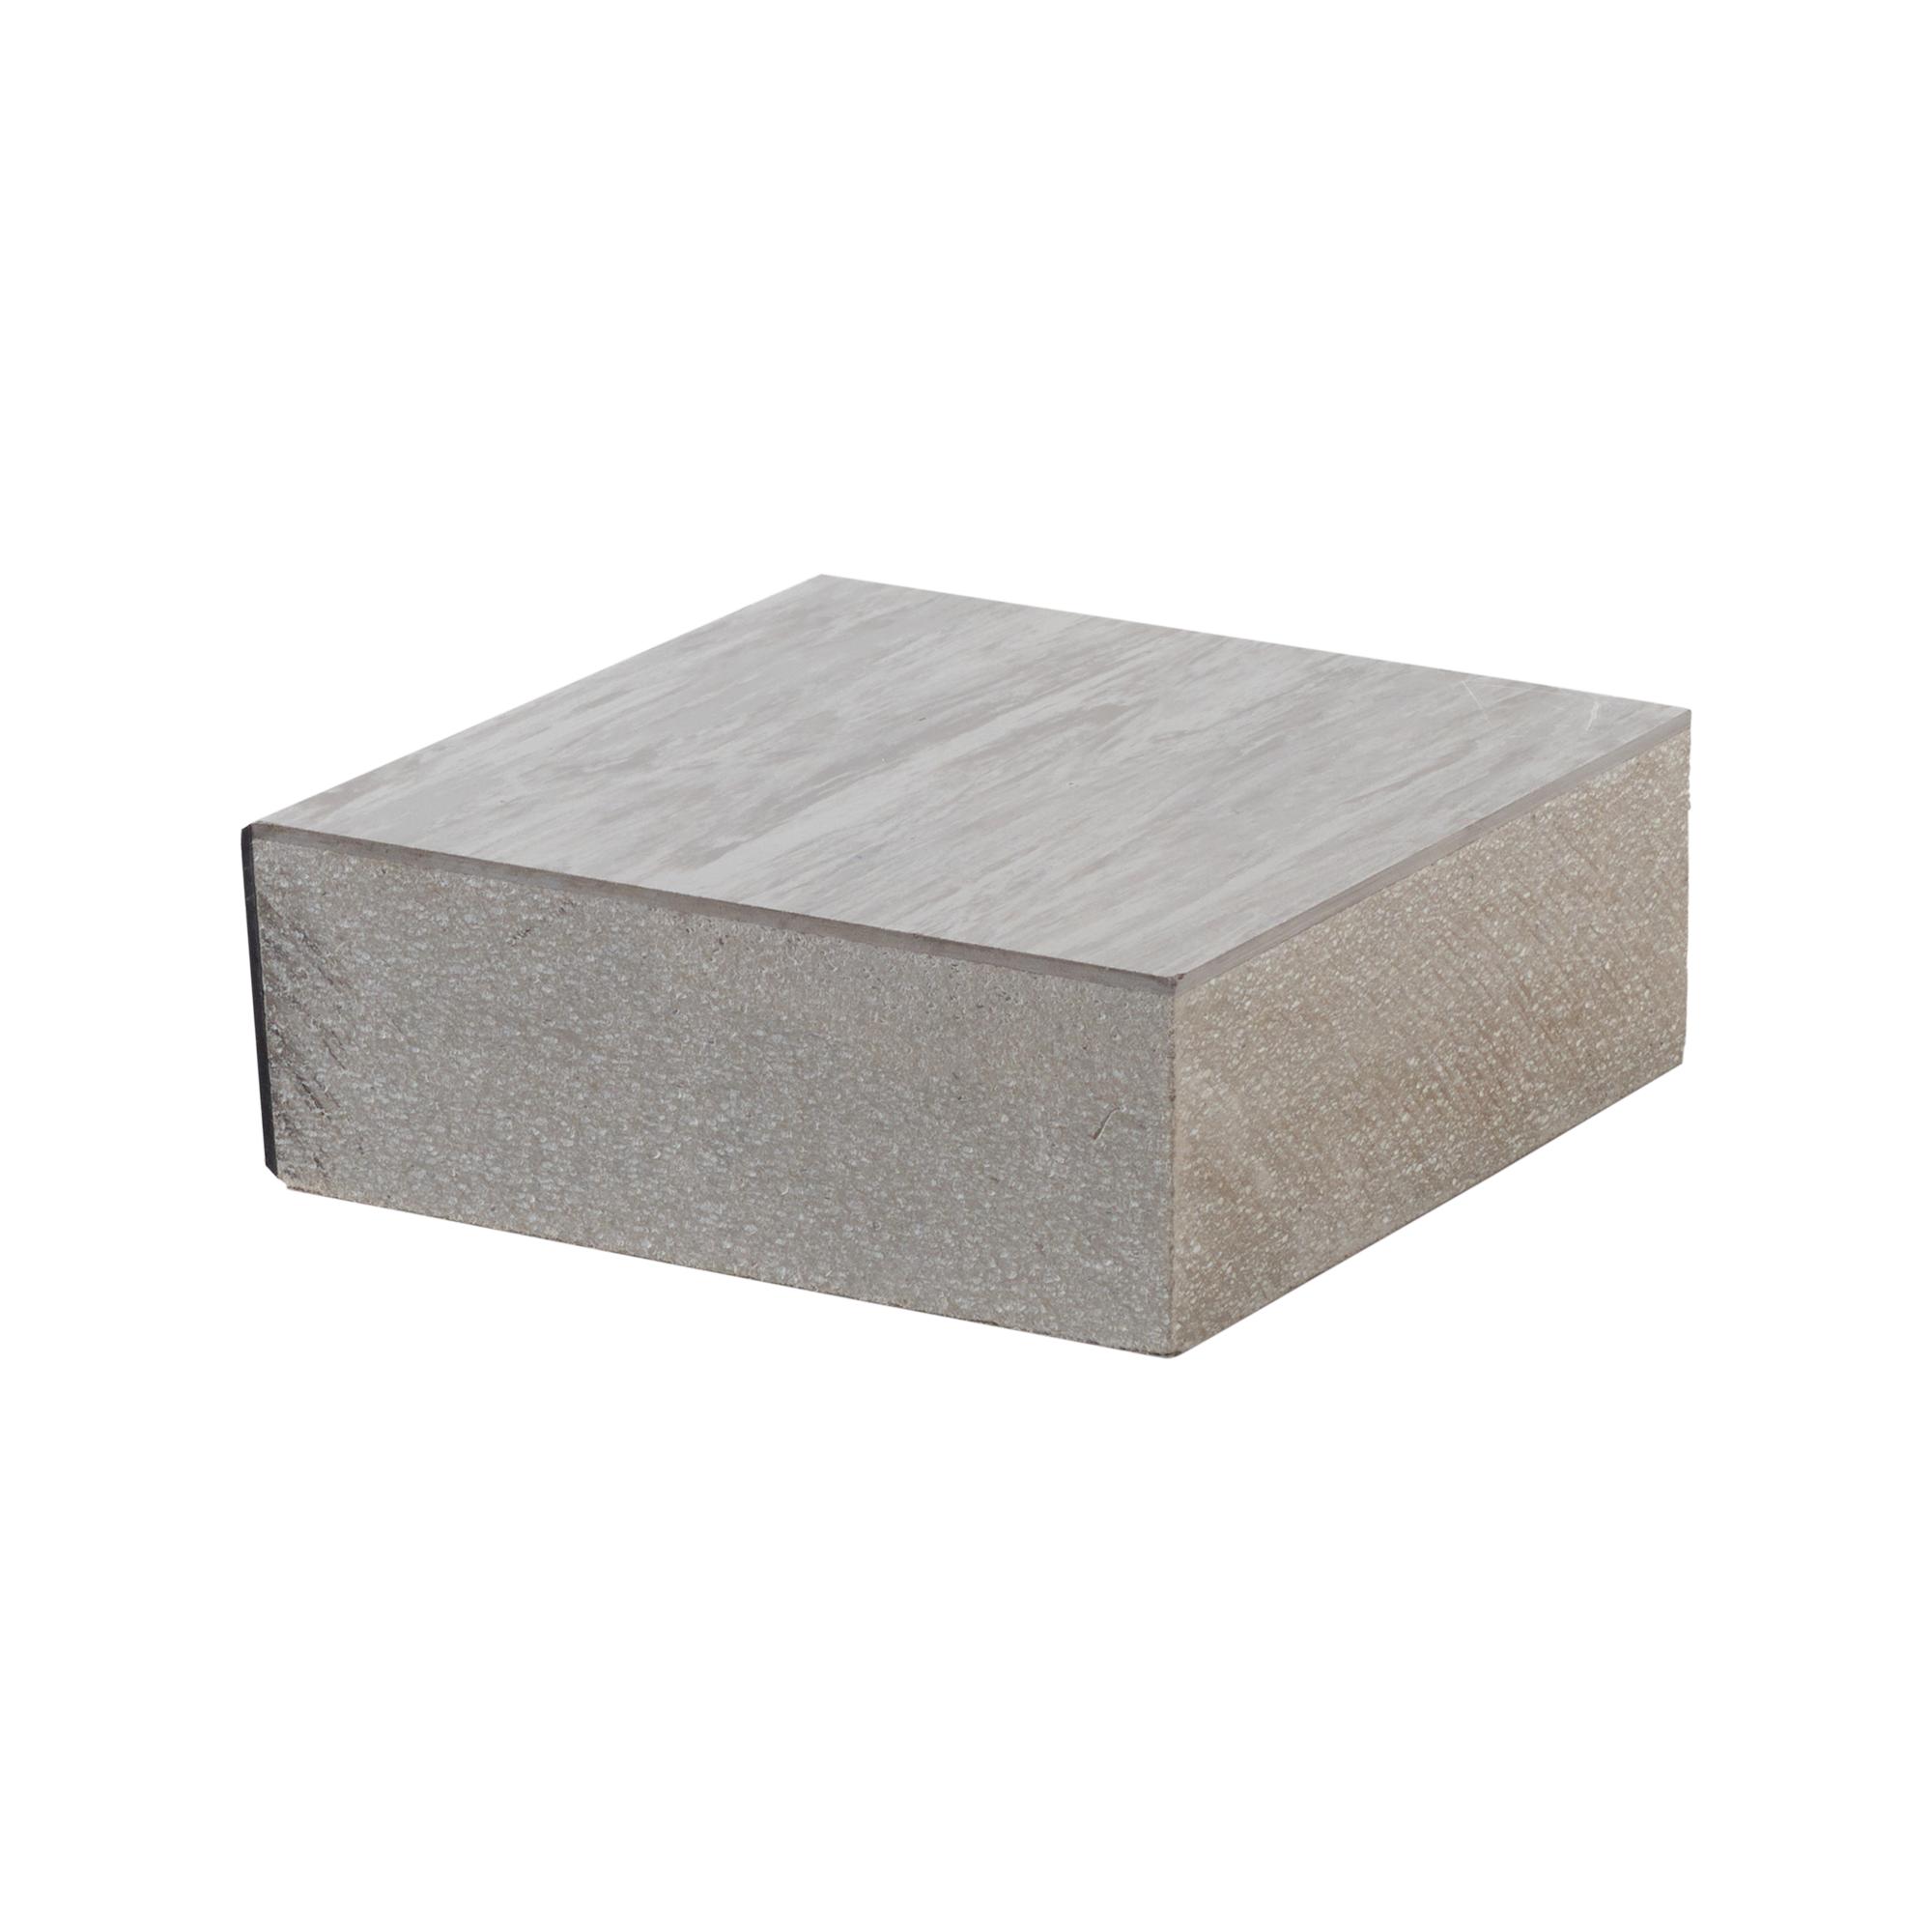 Calciumsulfat SC34AL005 - Calciumsulfat